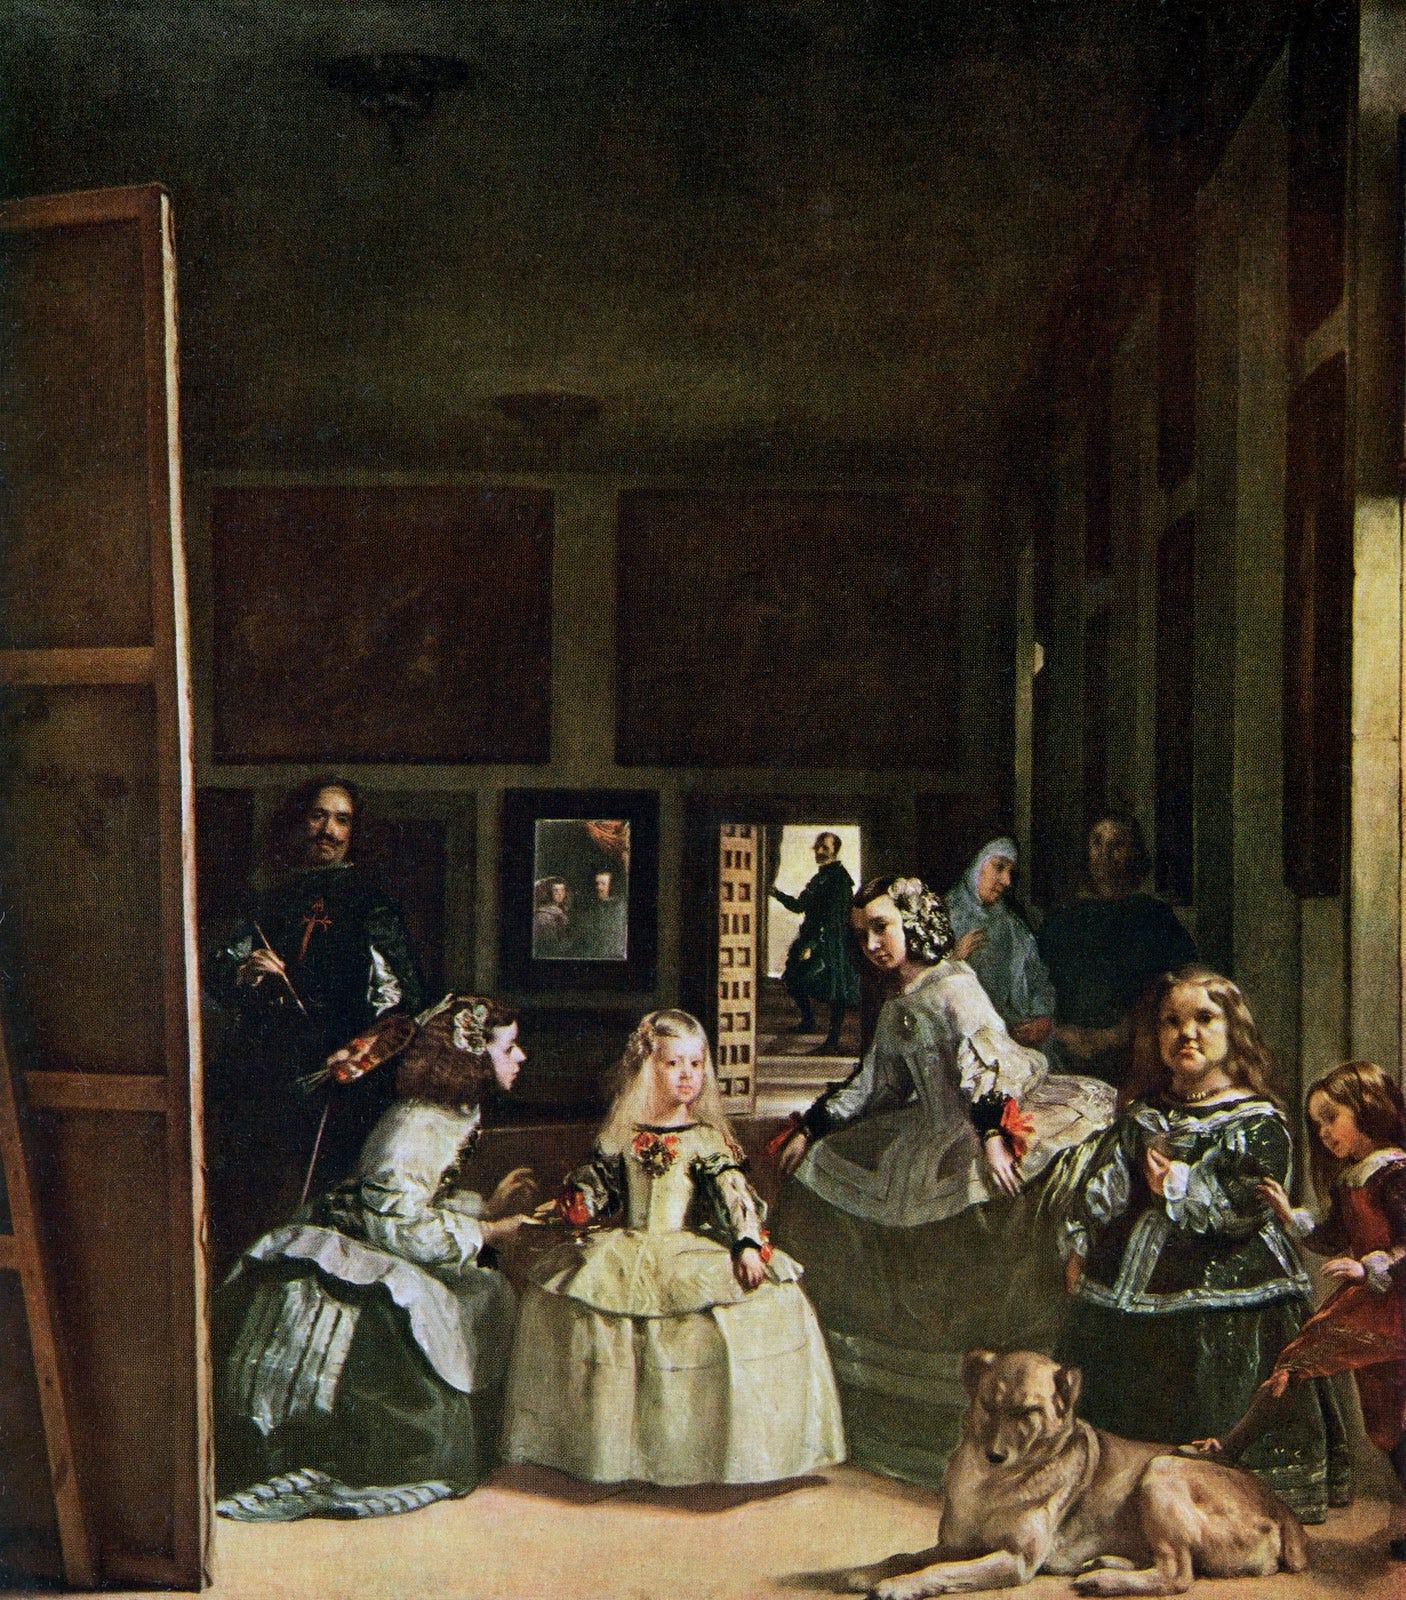 Diego Velazquez | Biography, Art, & Facts | Britannica